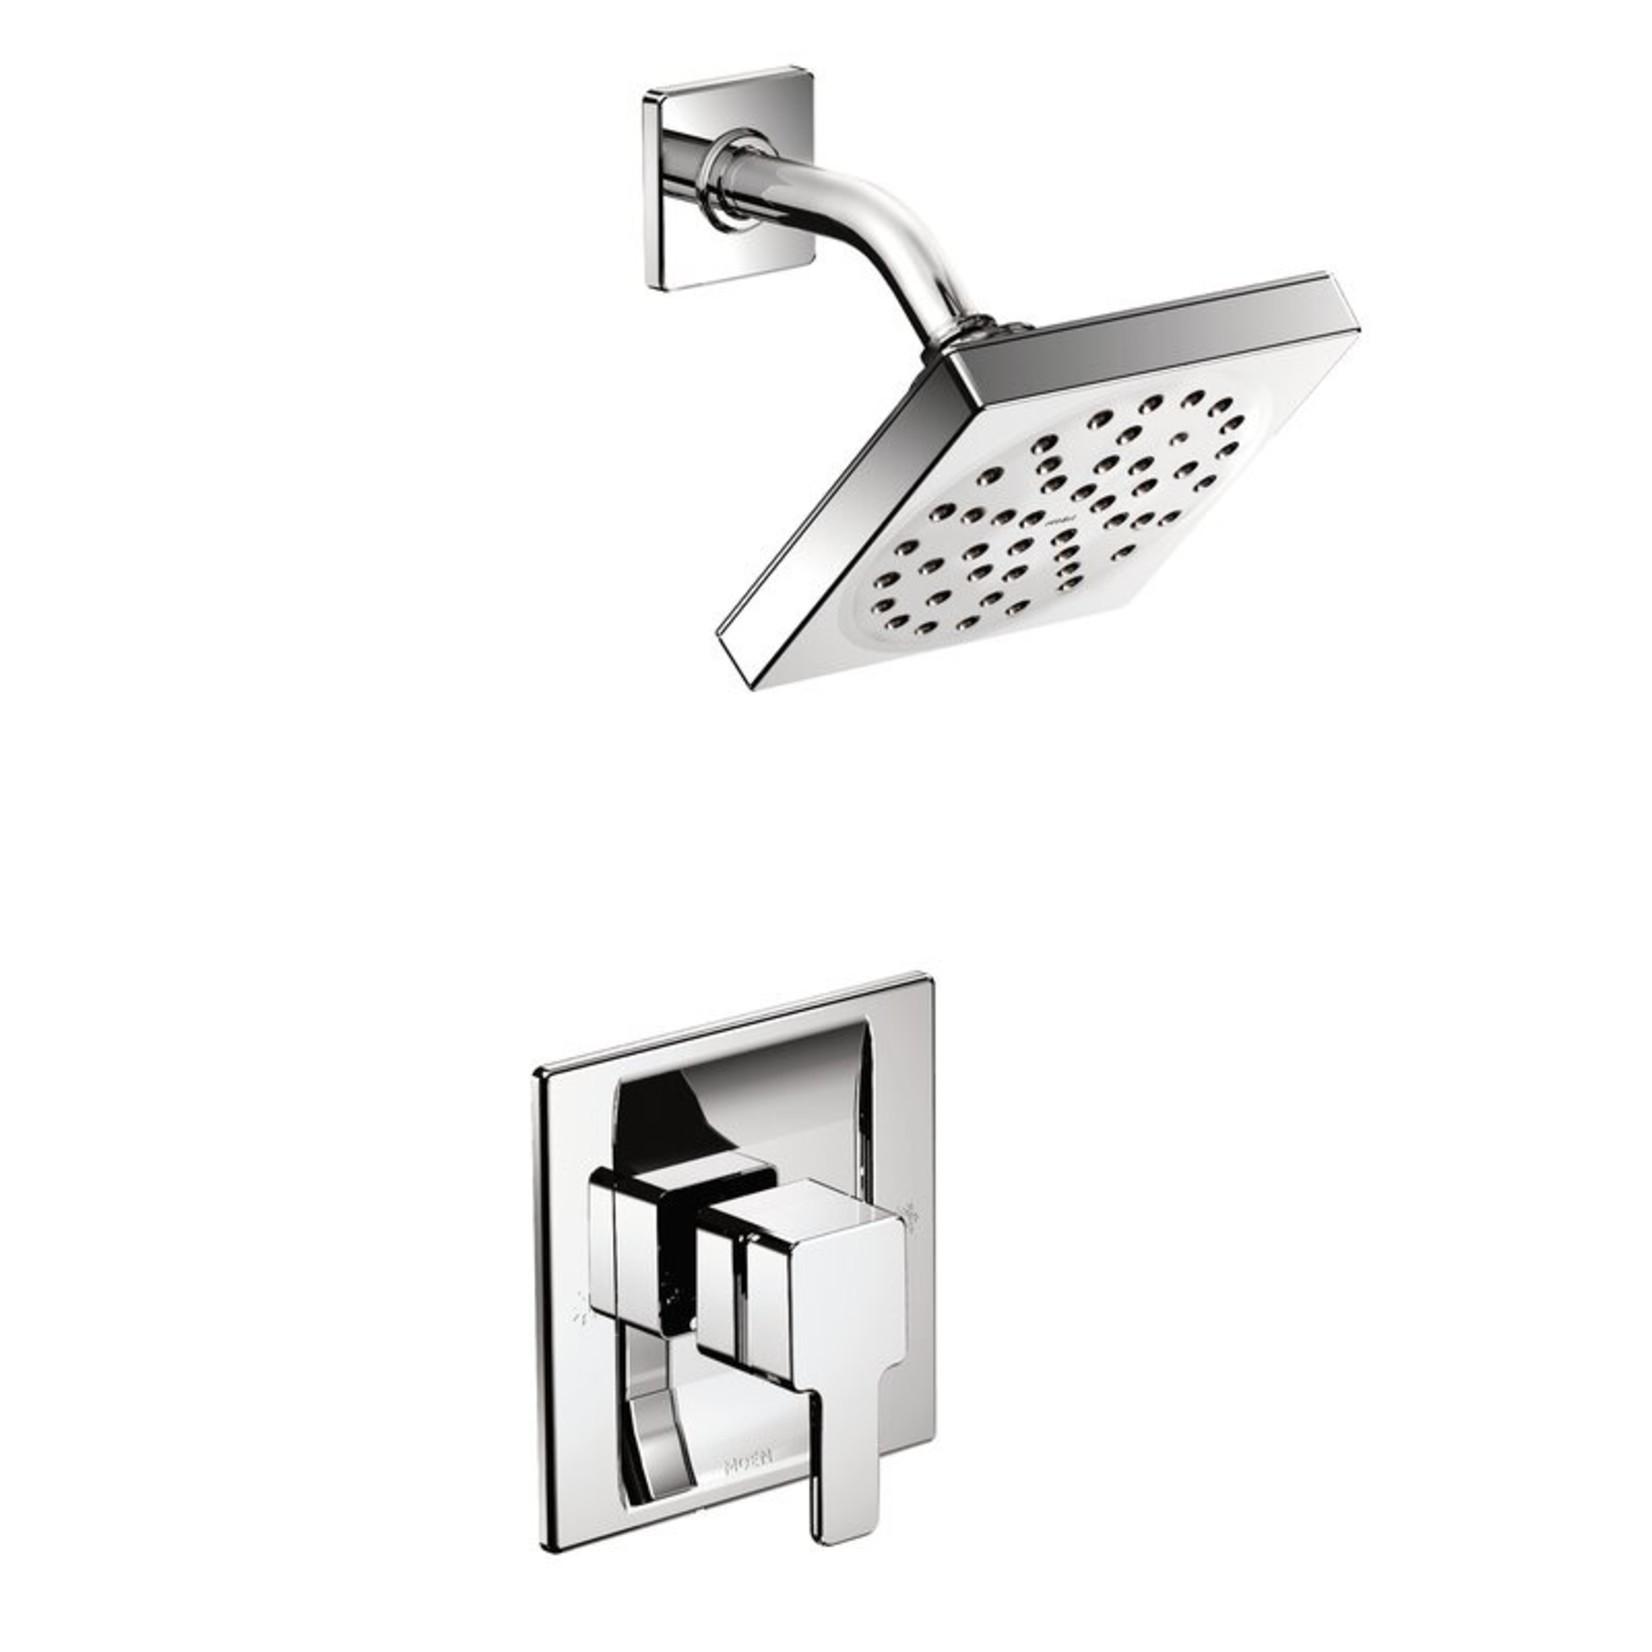 *90 Degree Pressure Balanced Shower Faucet with Posi-Temp - Chrome